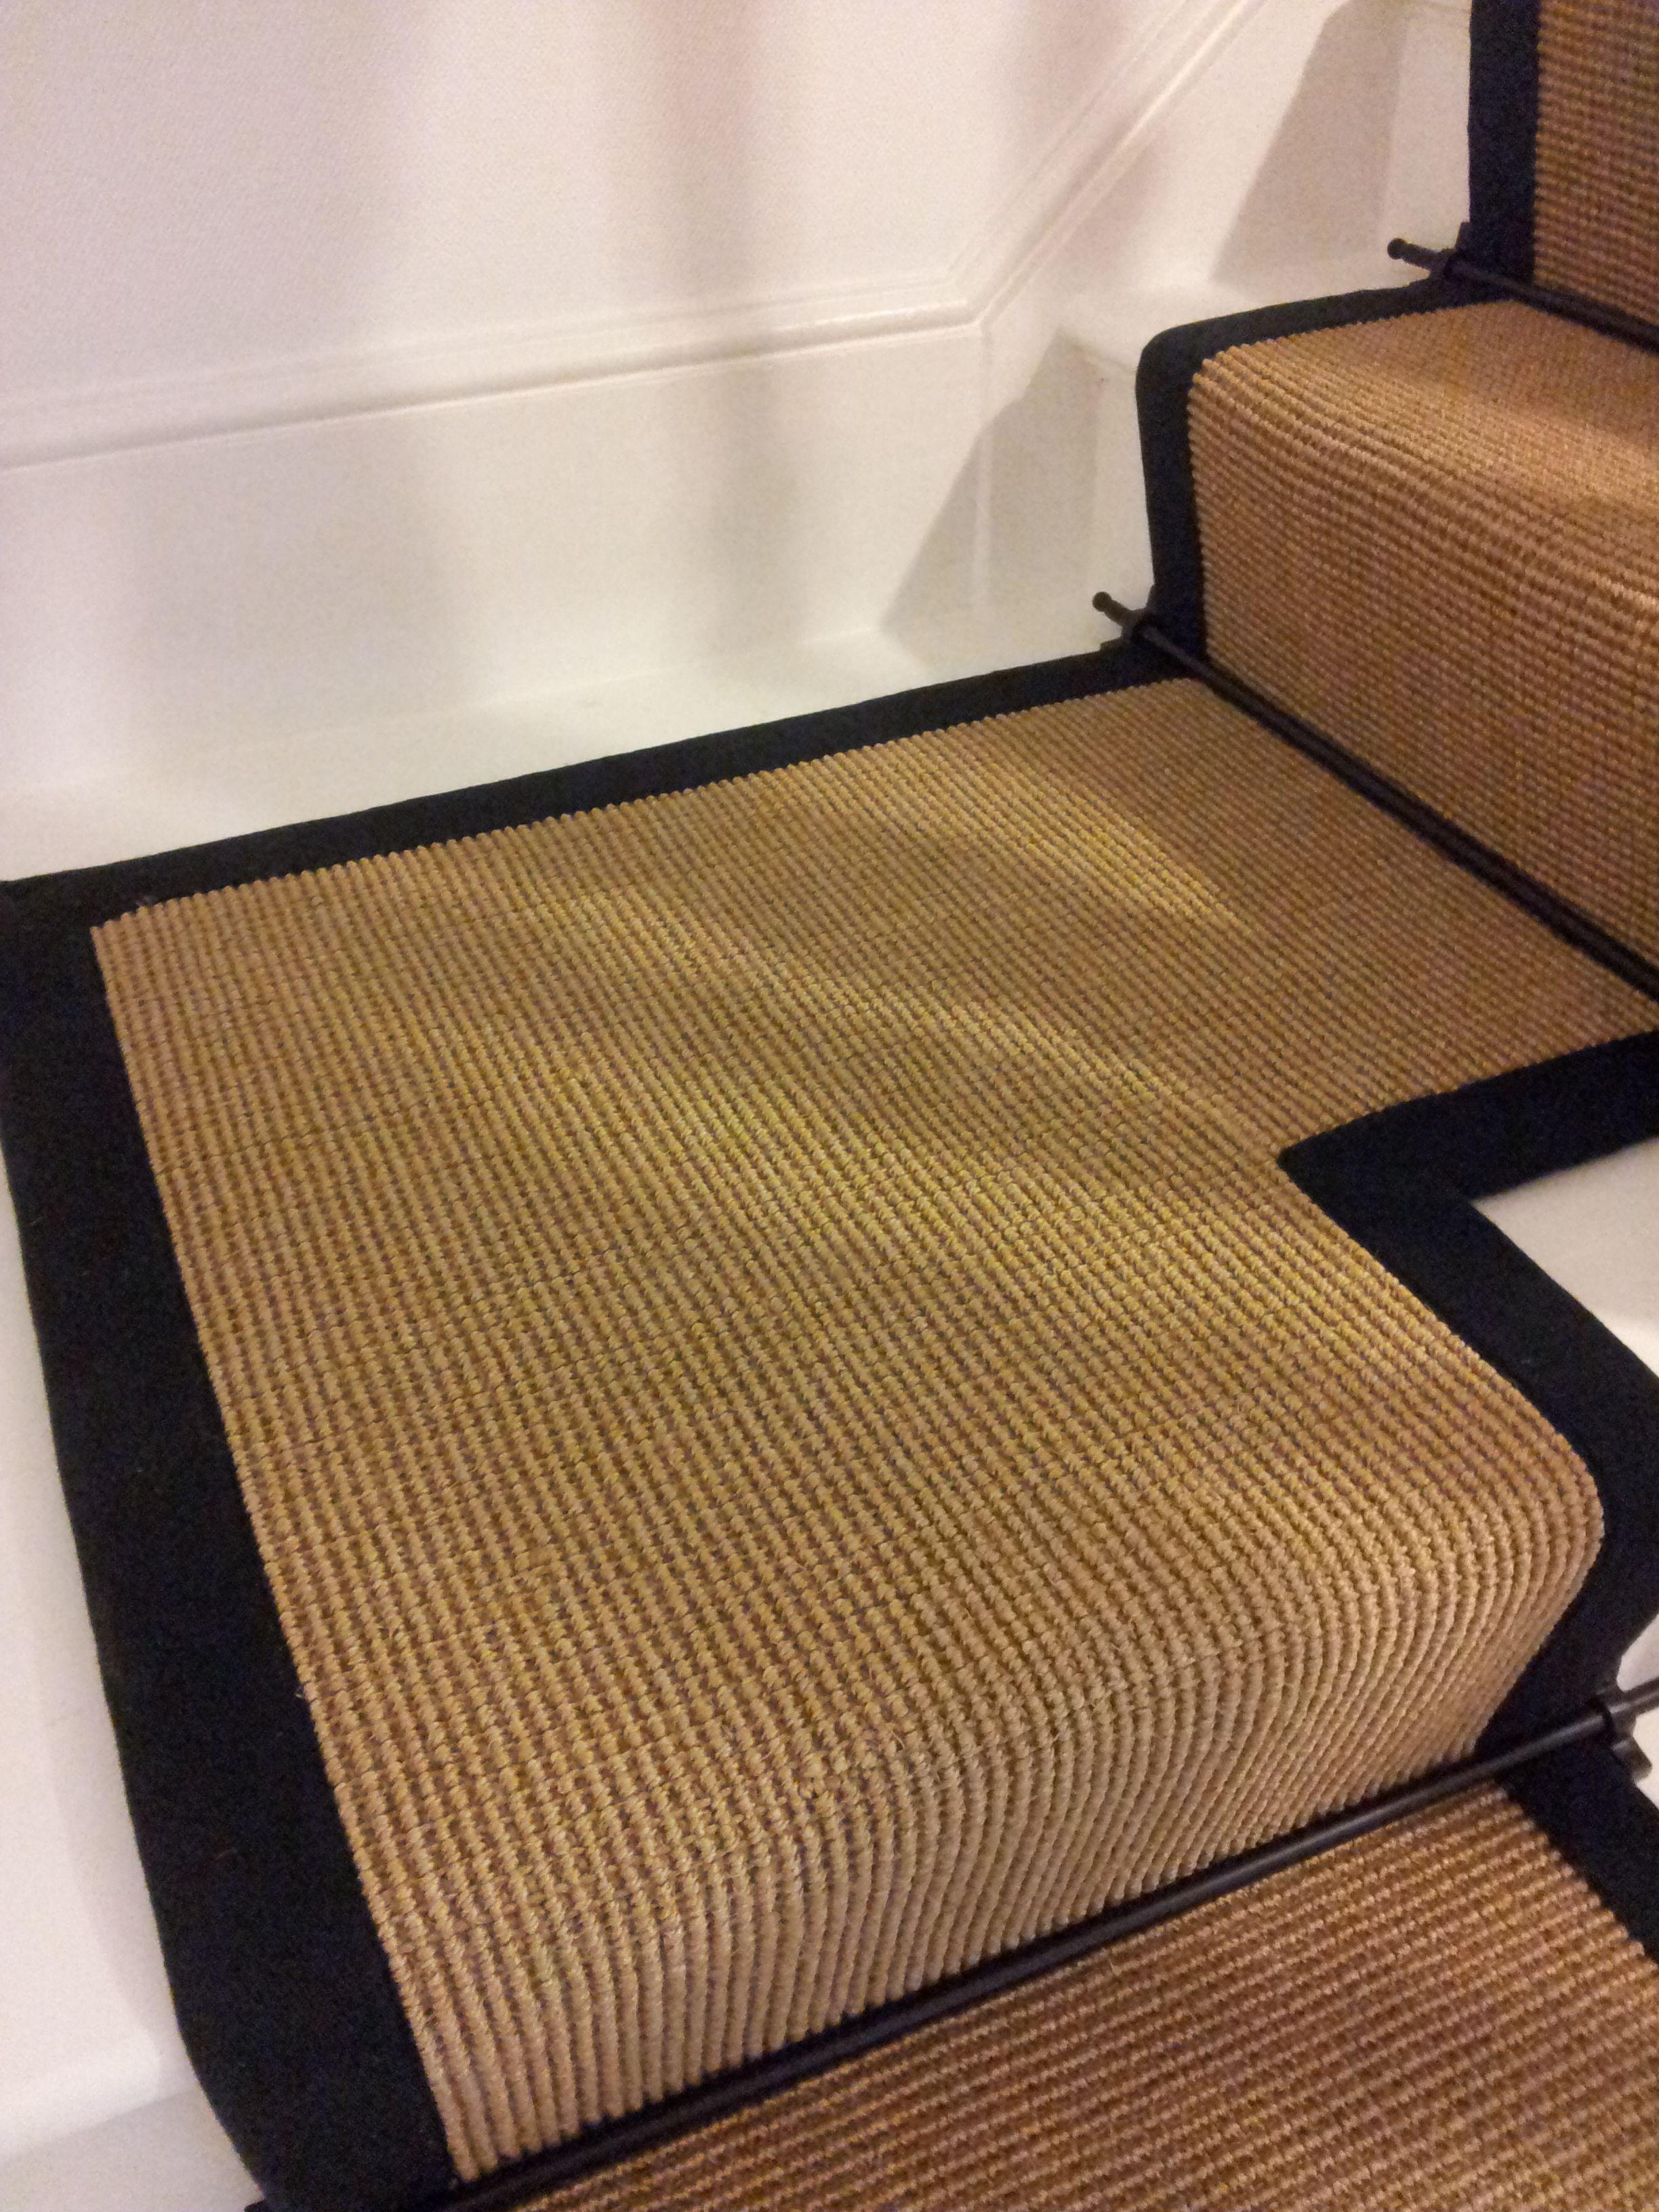 Best L Shape Close Up Jpg 2448×3264 Stair Runner Carpet Hallway Carpet Runners Carpet Stairs 400 x 300